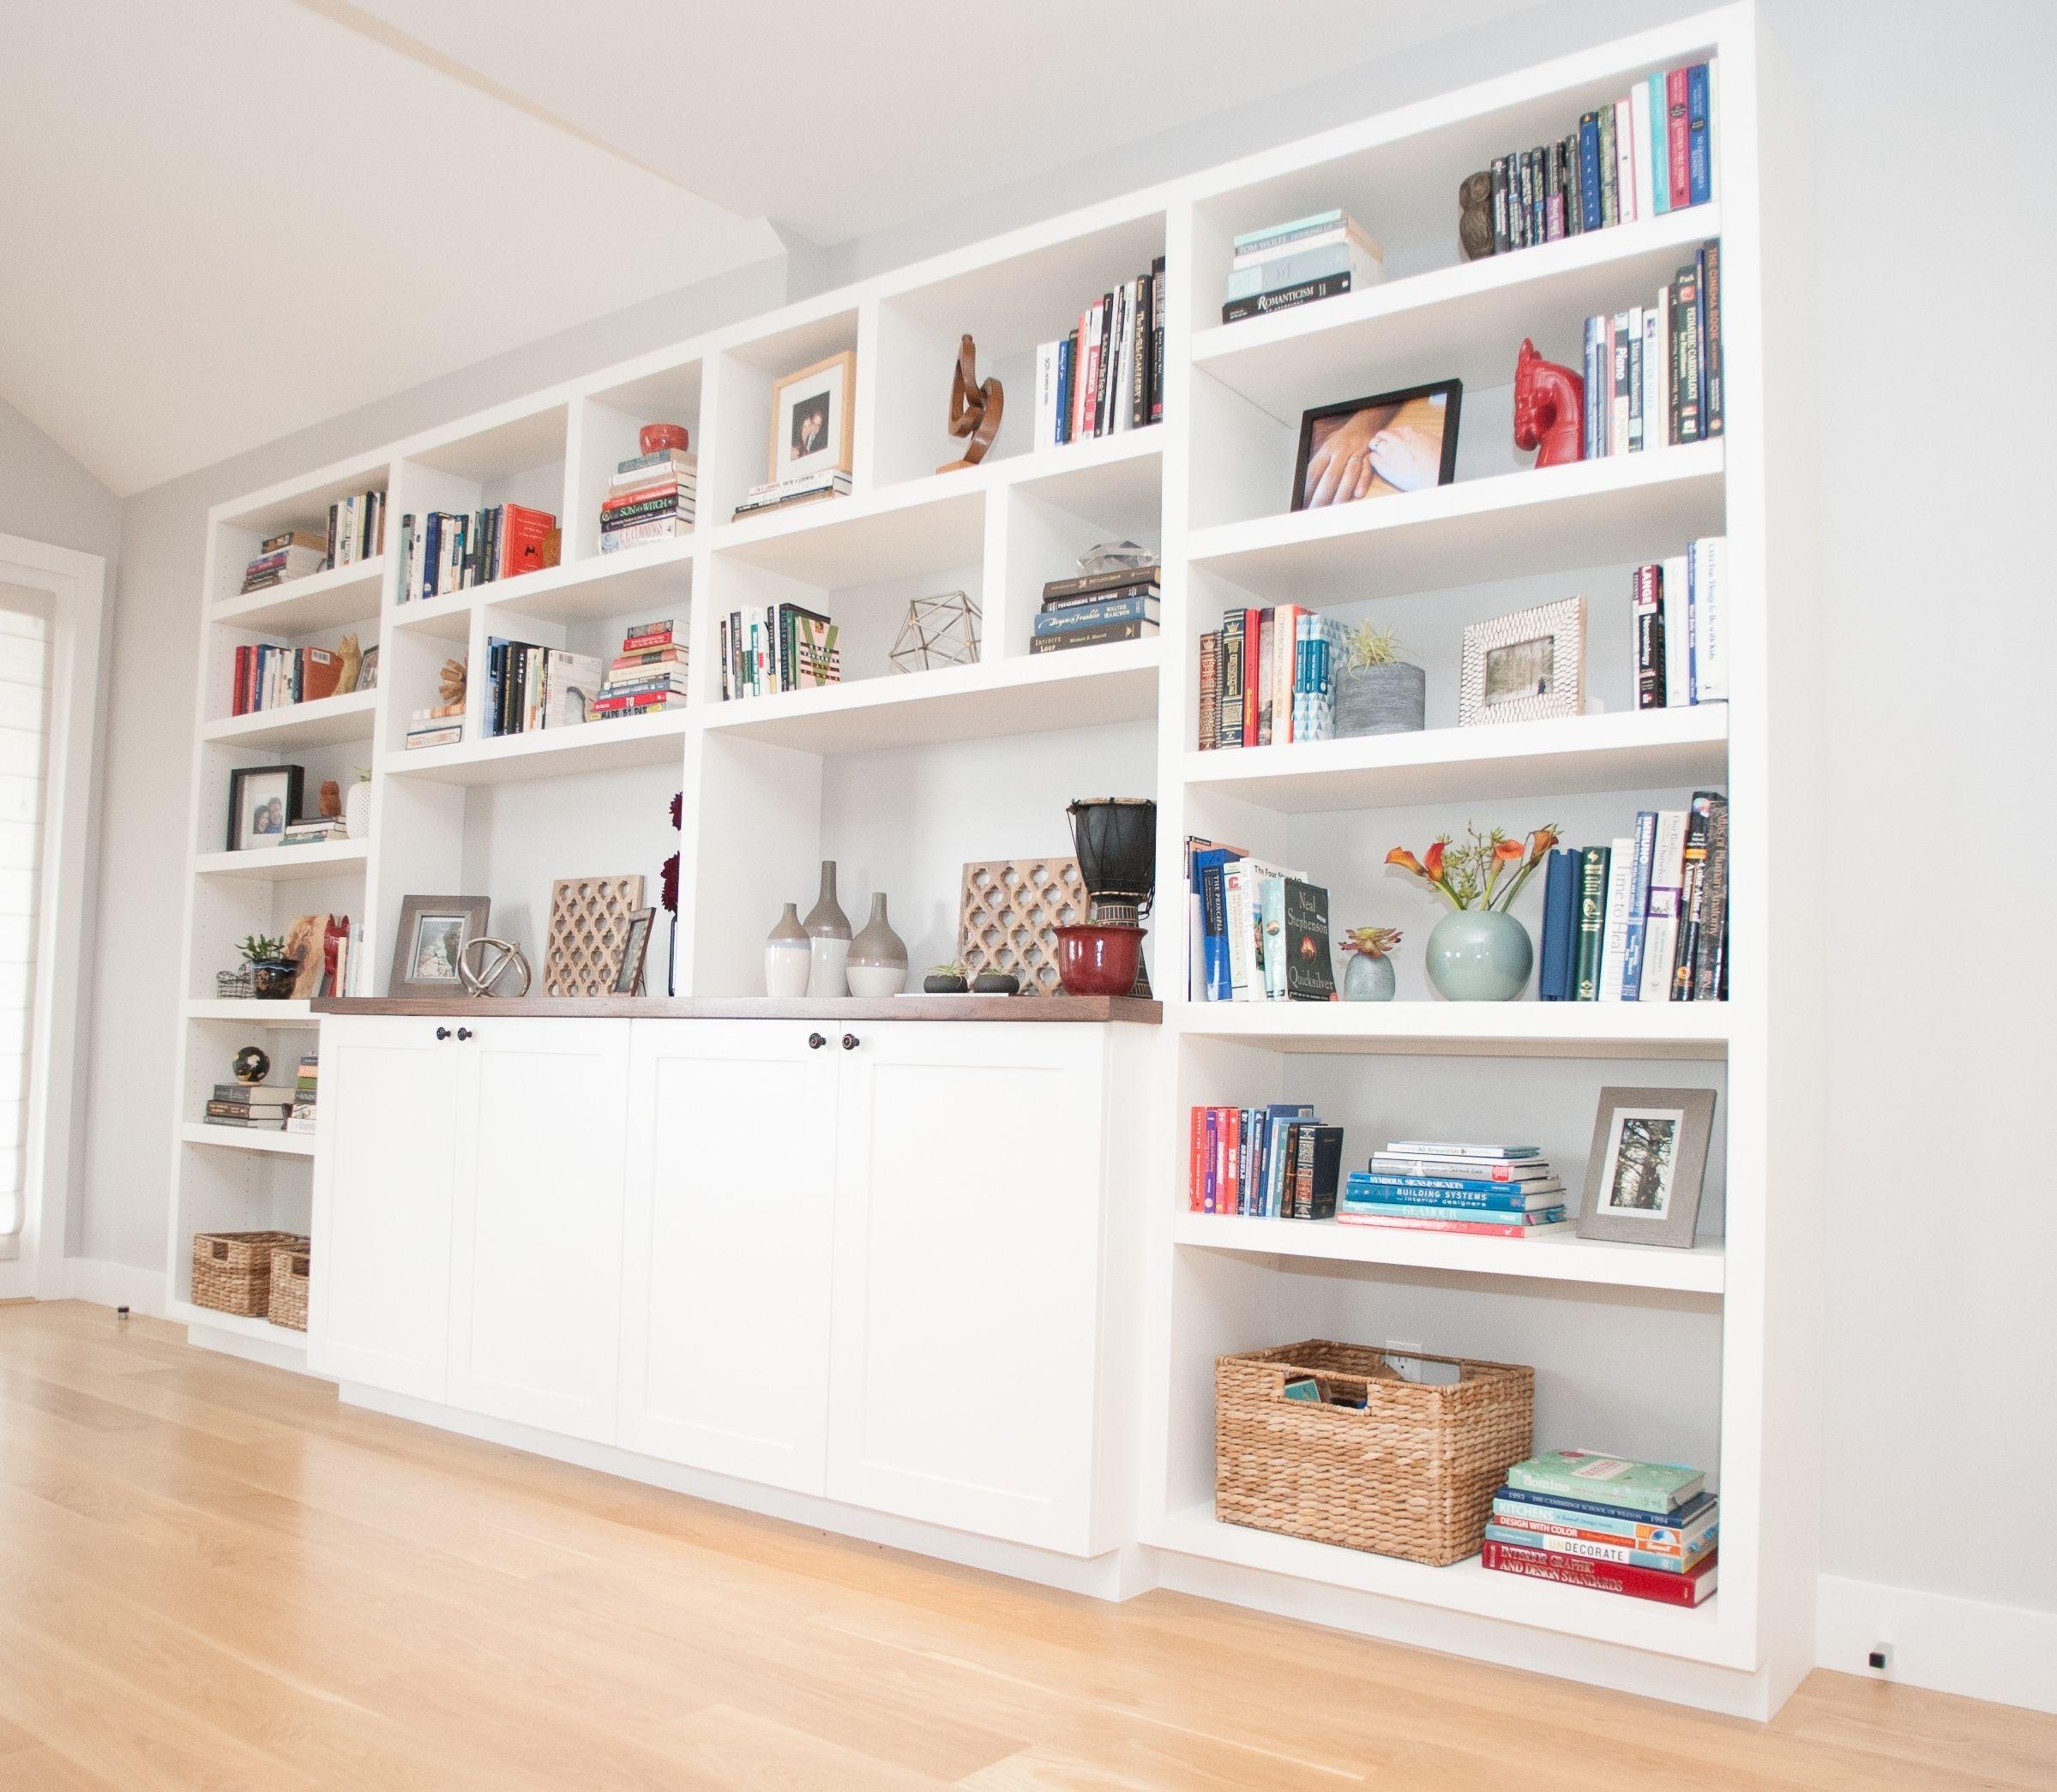 Jill cordner interior design san francisco bay area - Interior design san francisco bay area ...